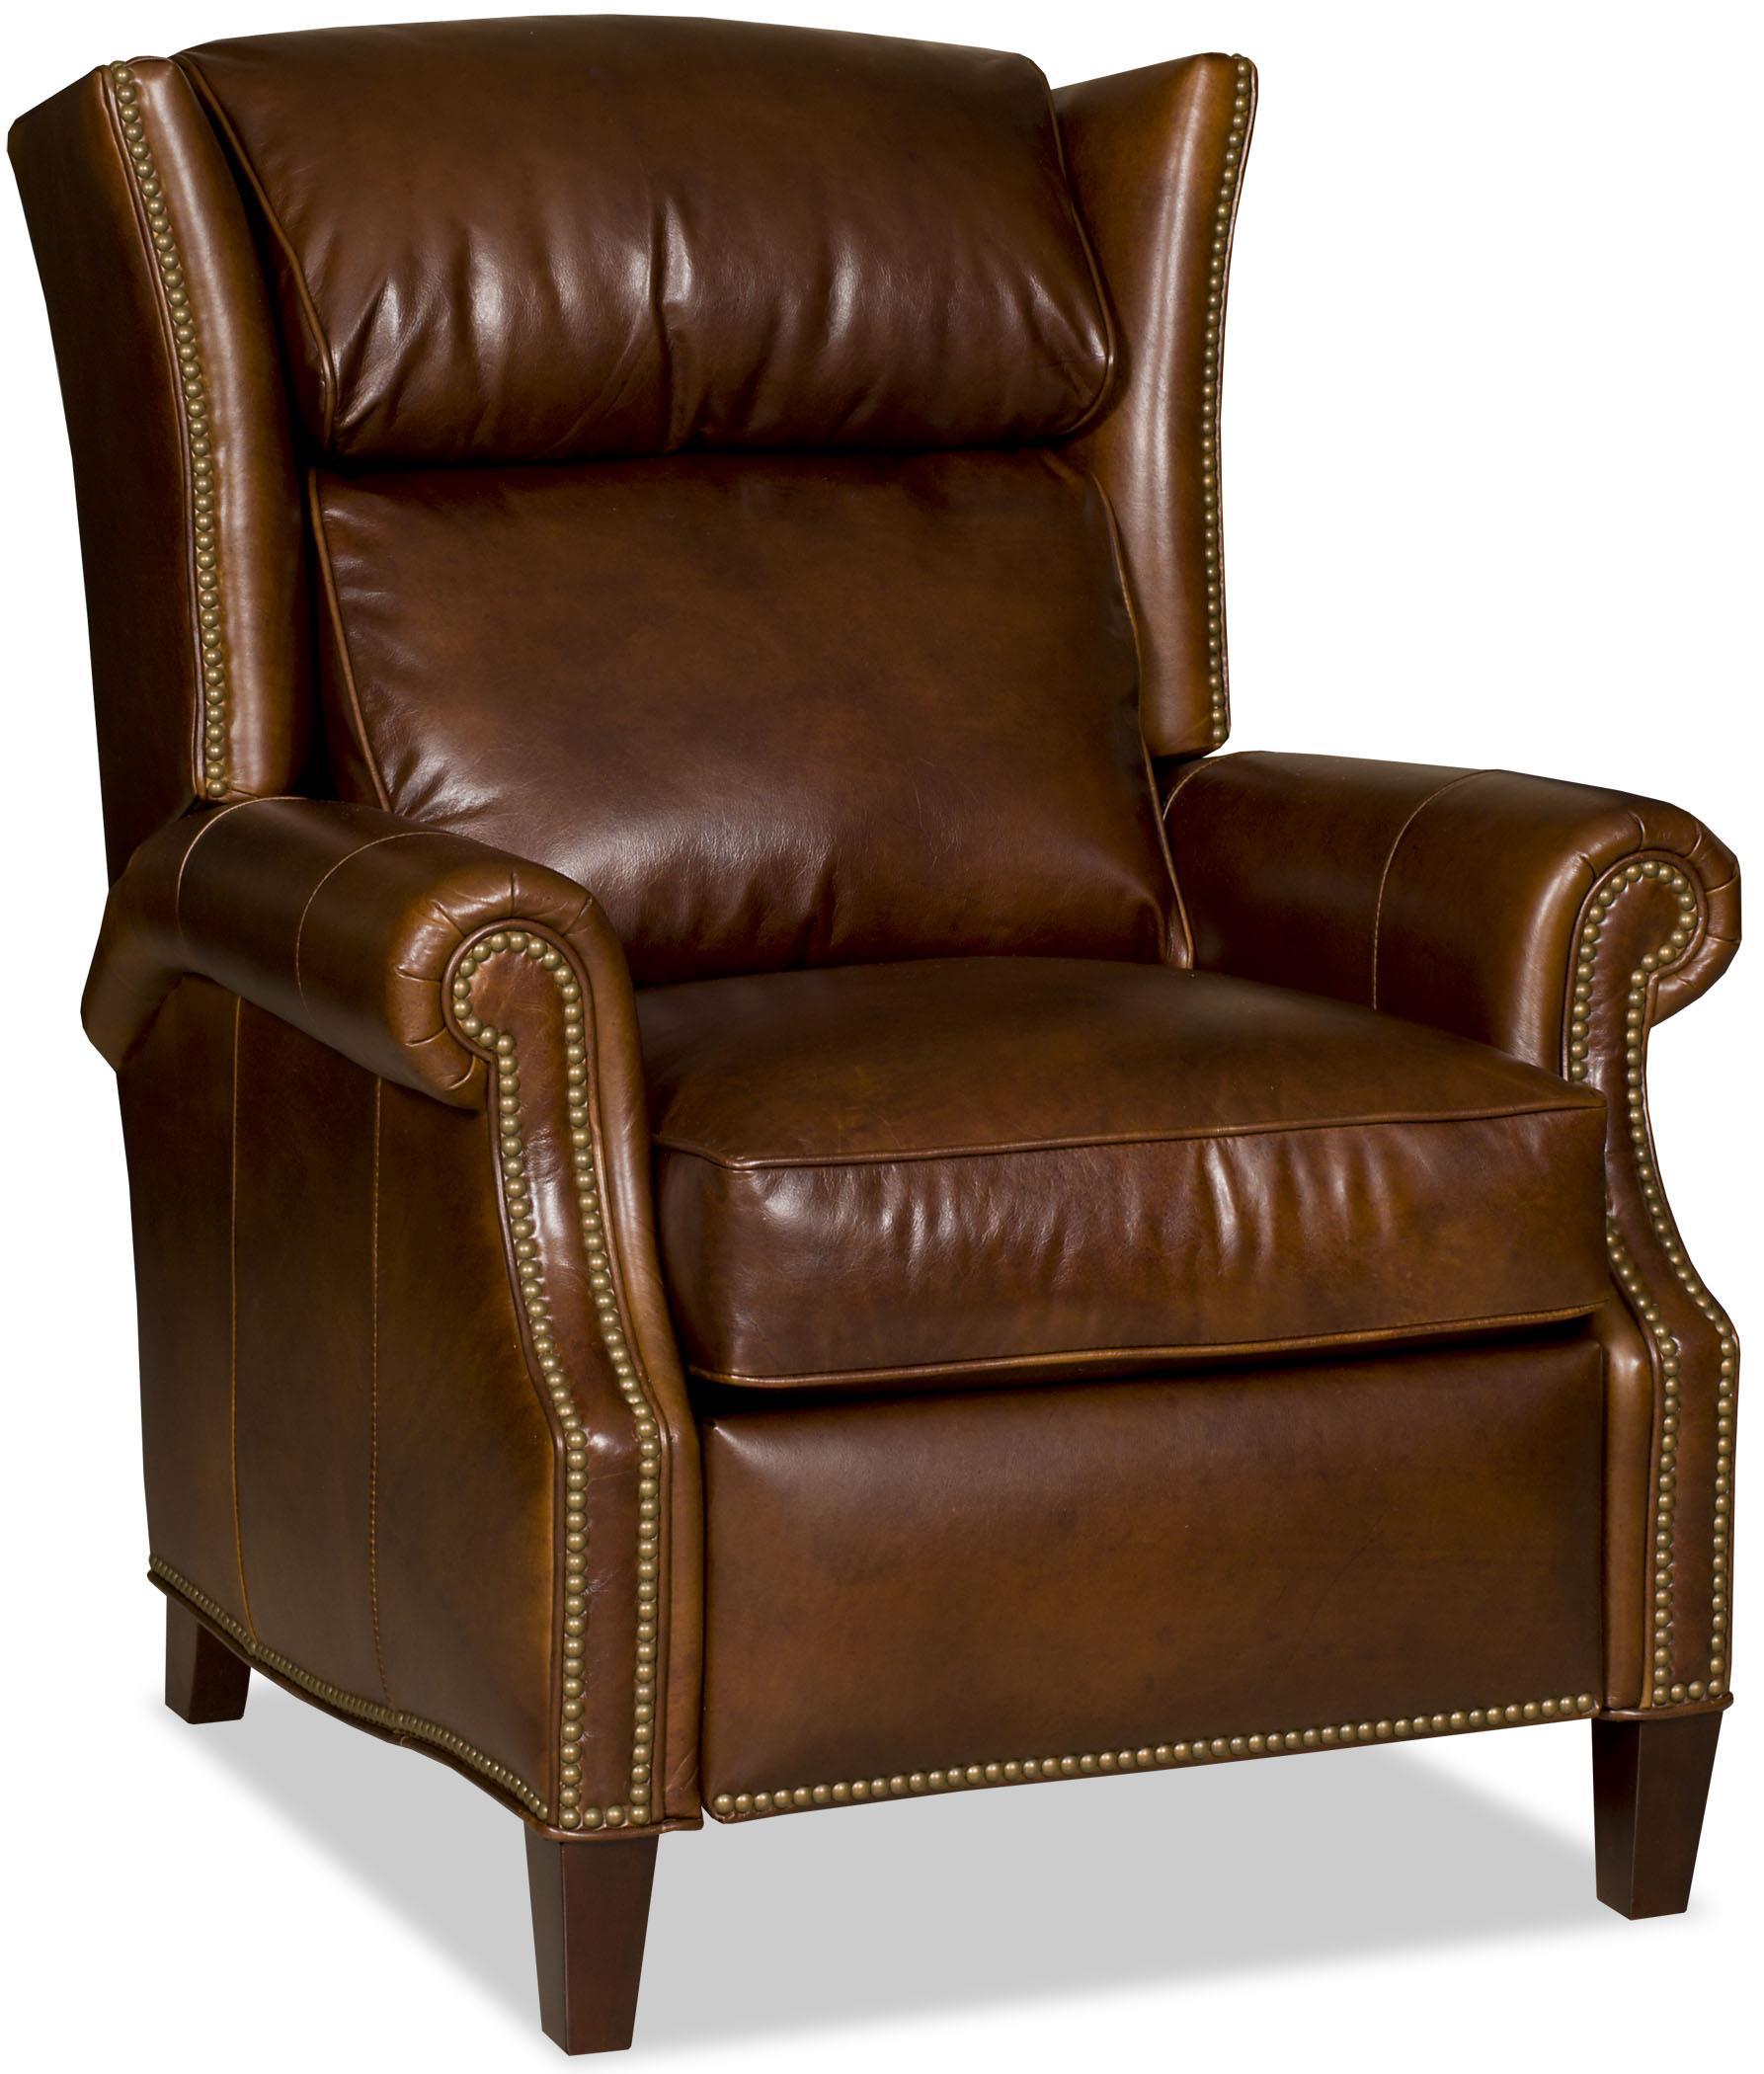 Bradington Young Chairs That ReclinePower High Leg